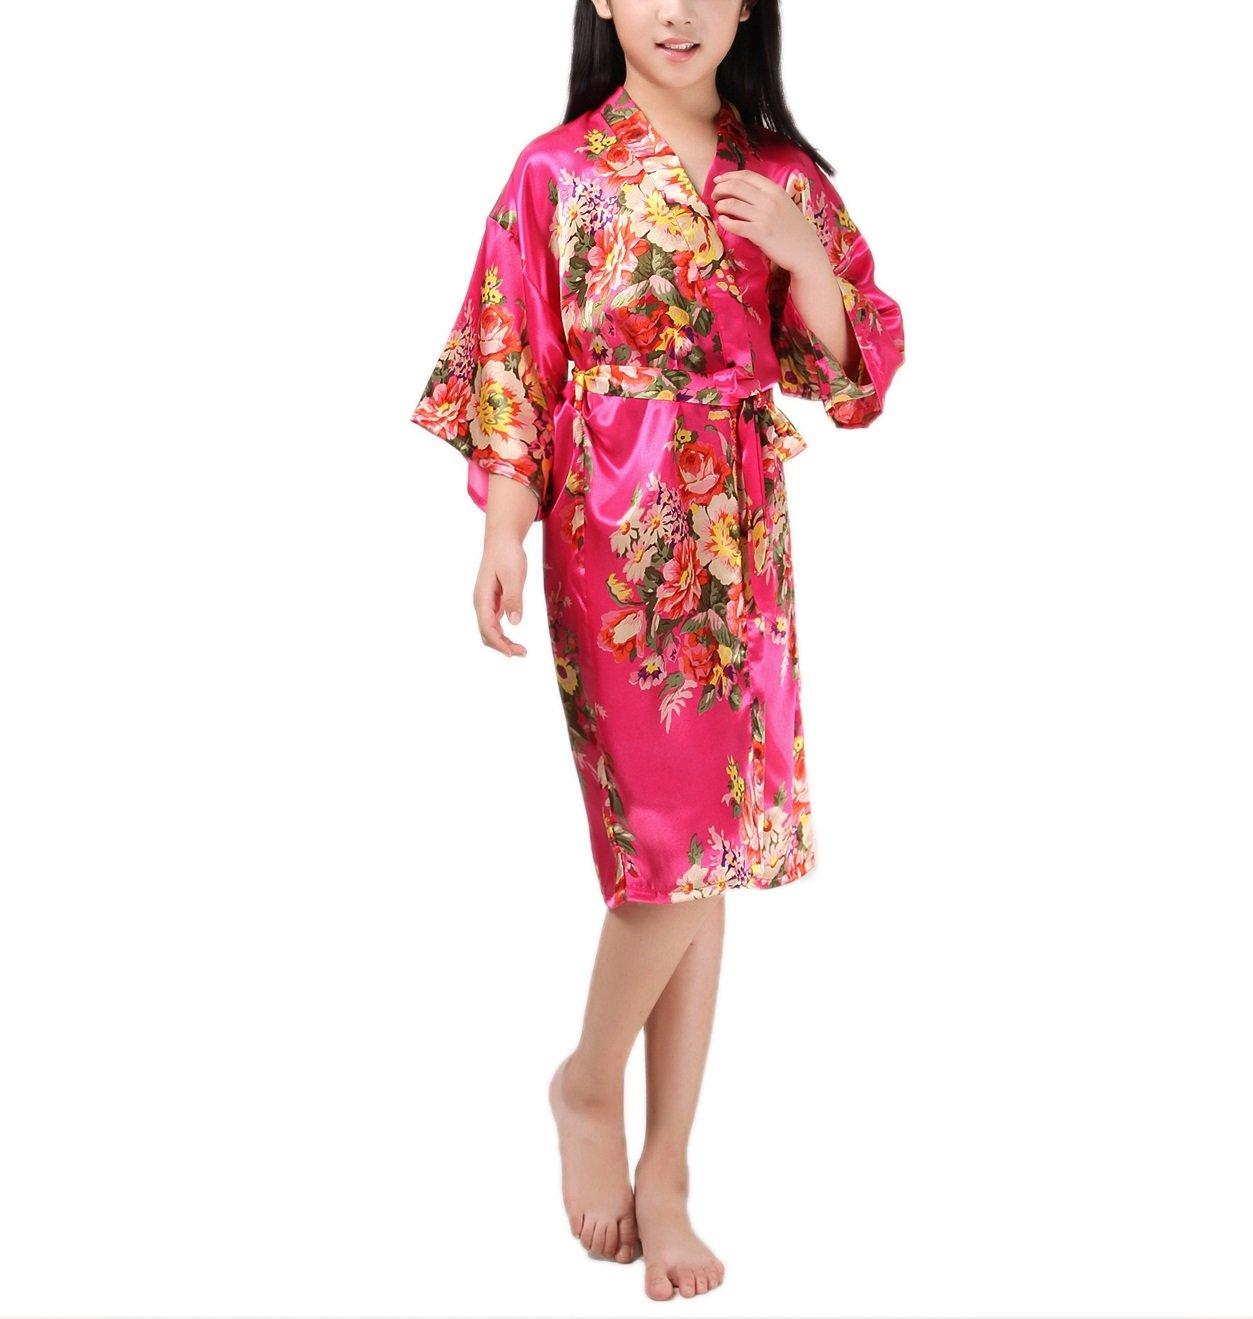 SexyTown Girls' Peacock Kimono Robe Satin Bridesmaid Sleepwear Wedding Nightgown (8/Height 39.4-43.3 inch, Style2-Rose Red)